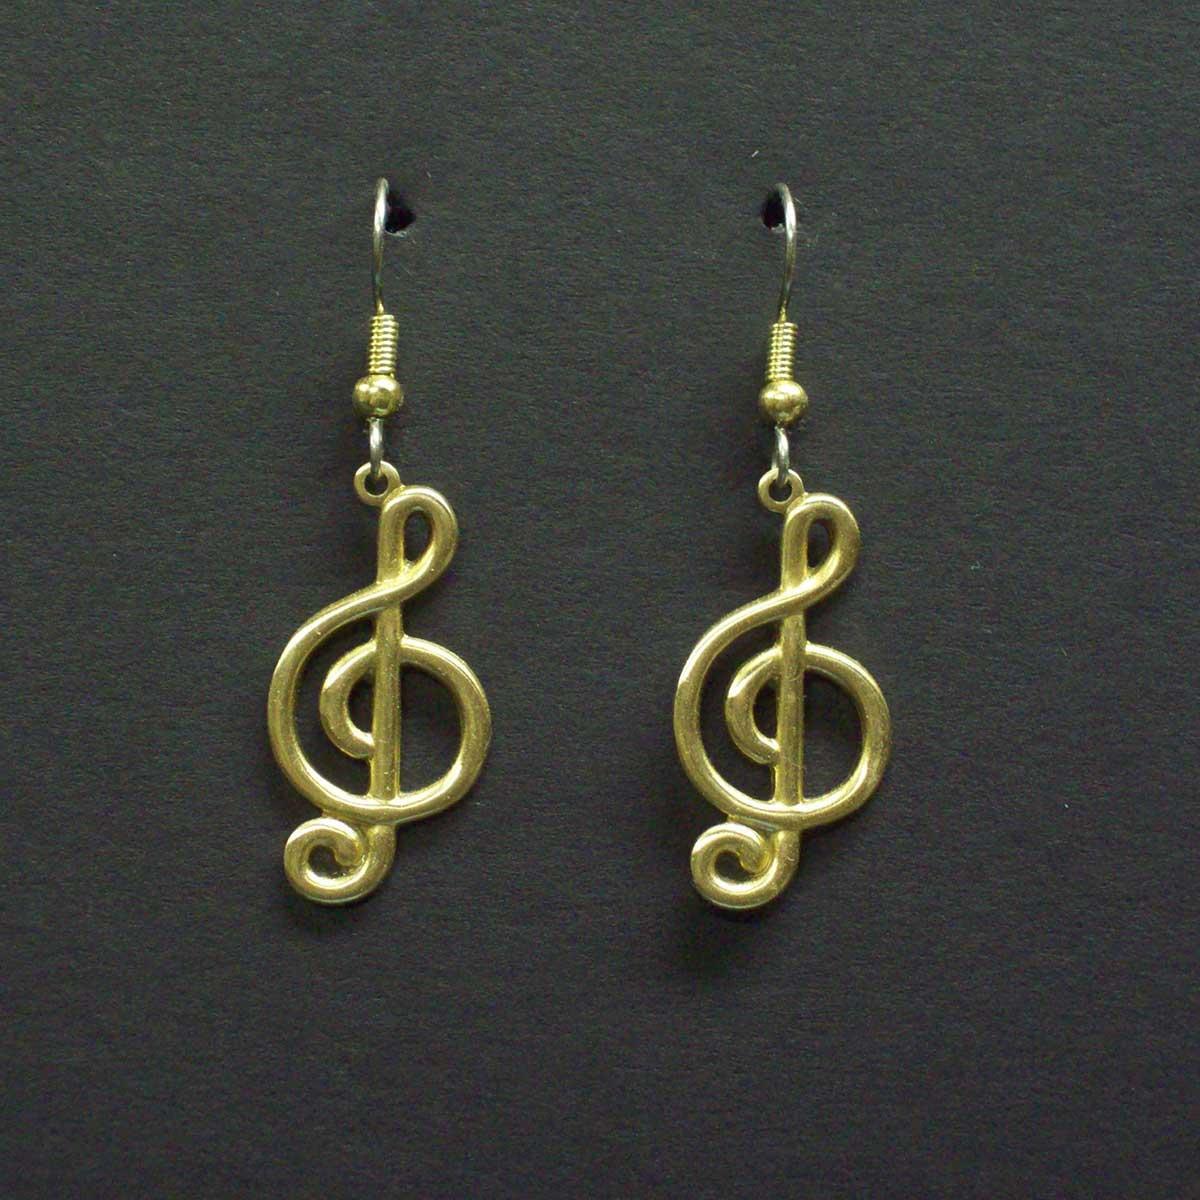 Treble Clef 2 Dangle Earrings.